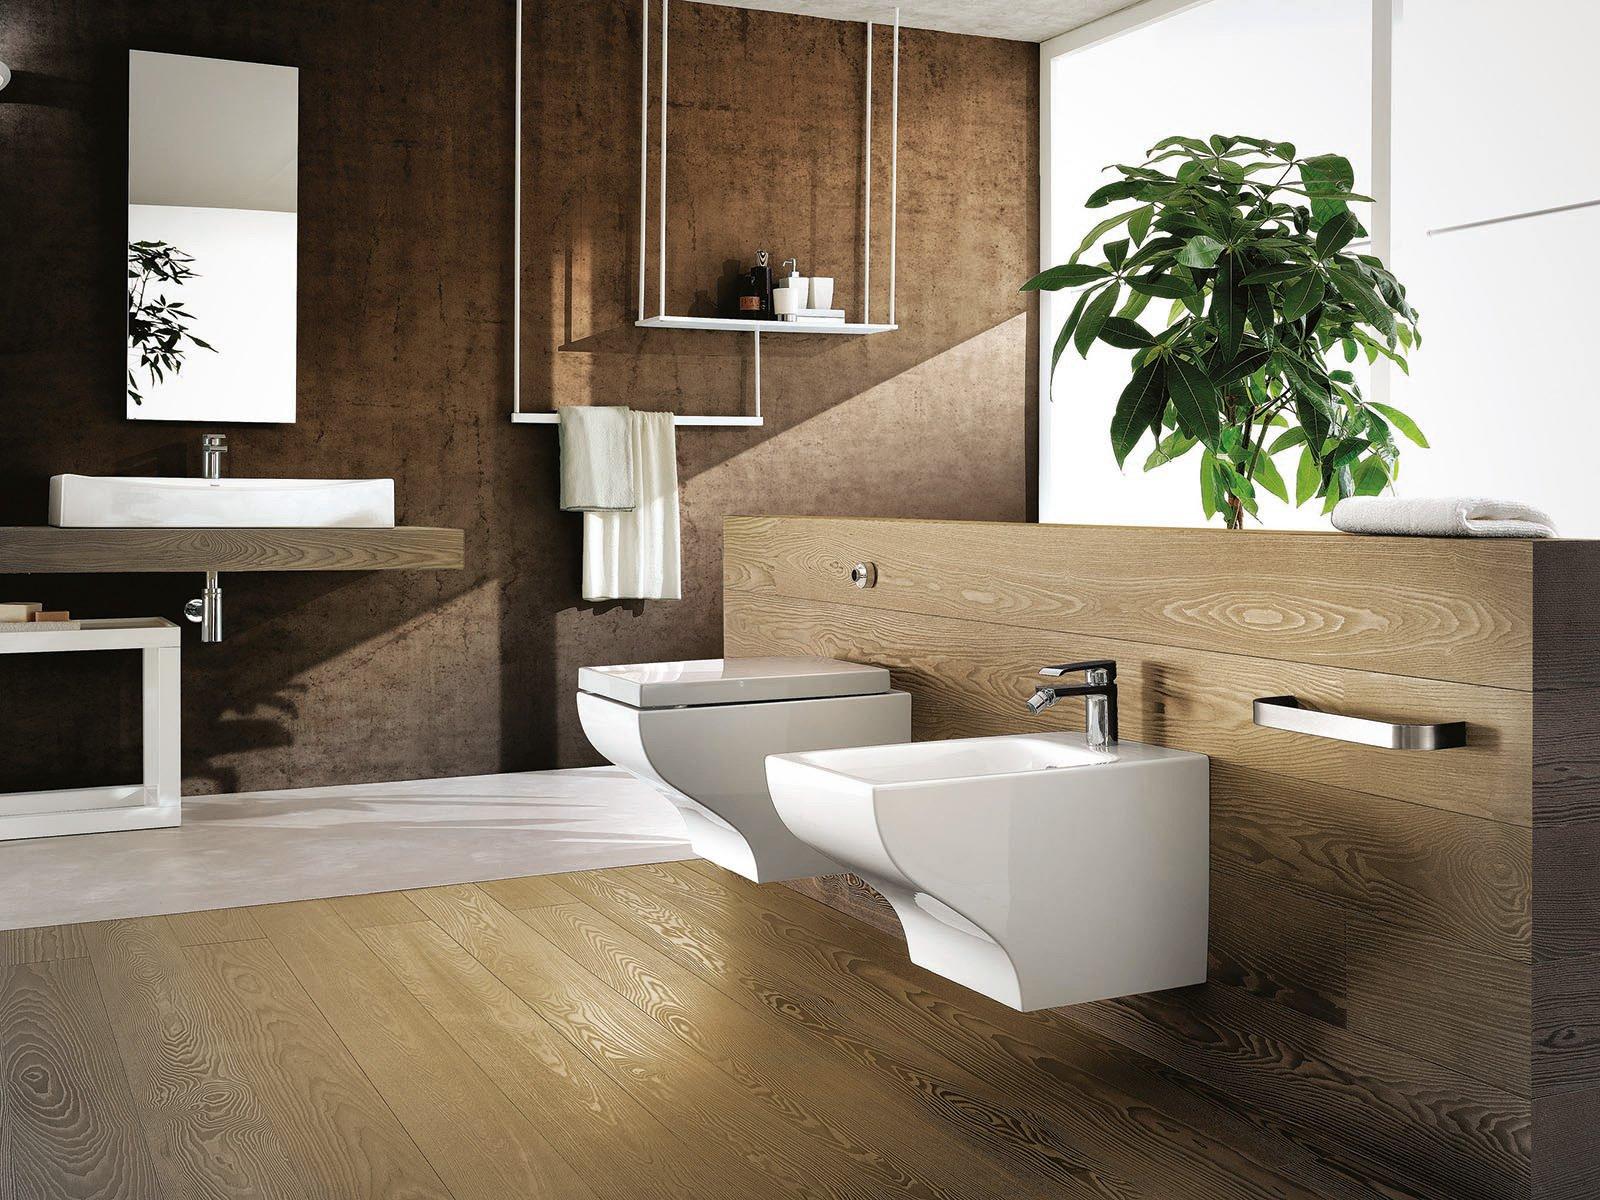 Sanitari sospesi per un bagno contemporaneo cose di casa for Vasi sospesi